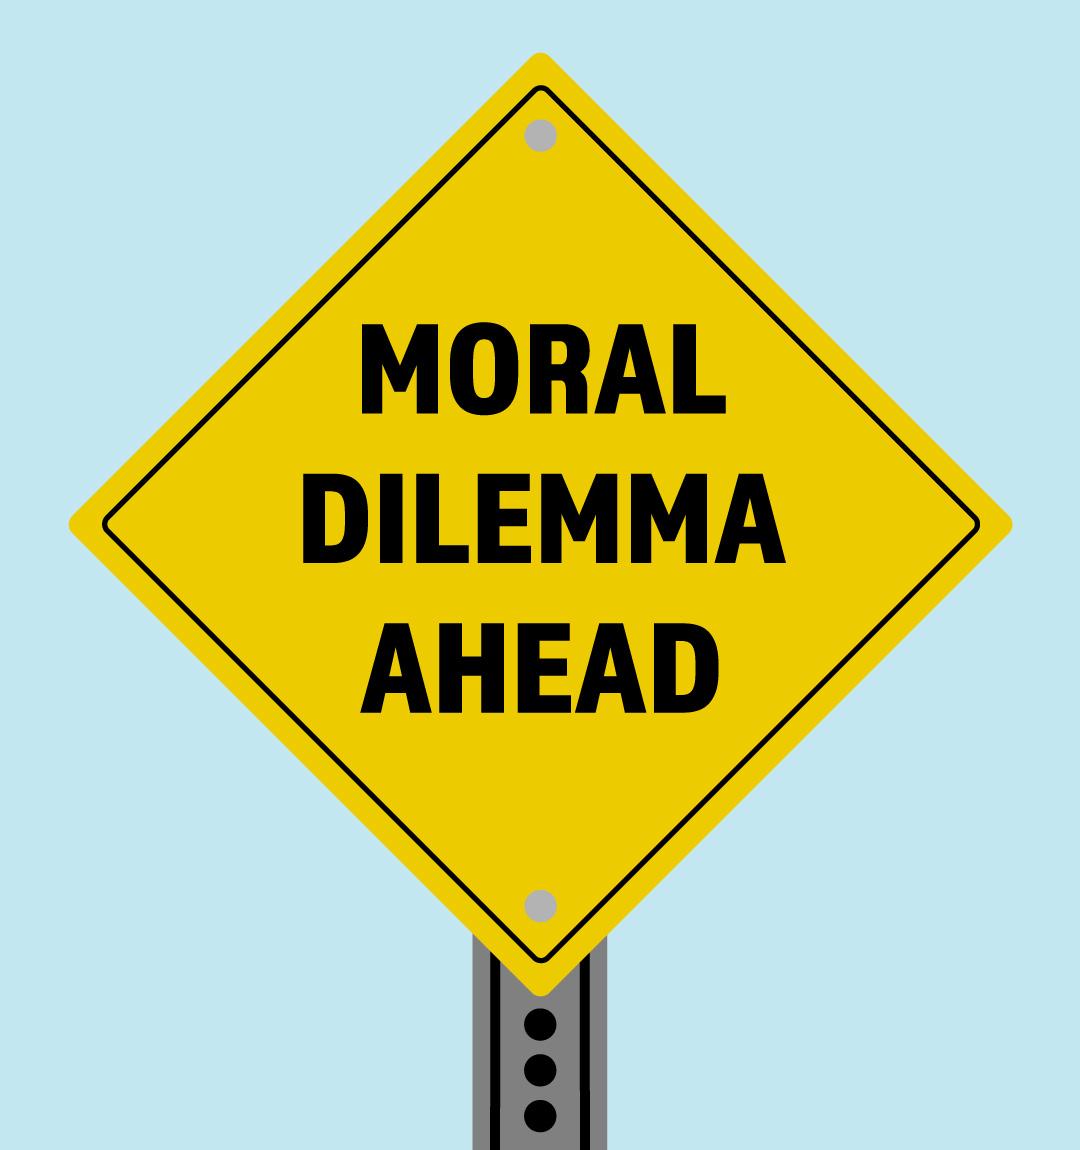 Moral-Dilemma-Ahead-road-sign